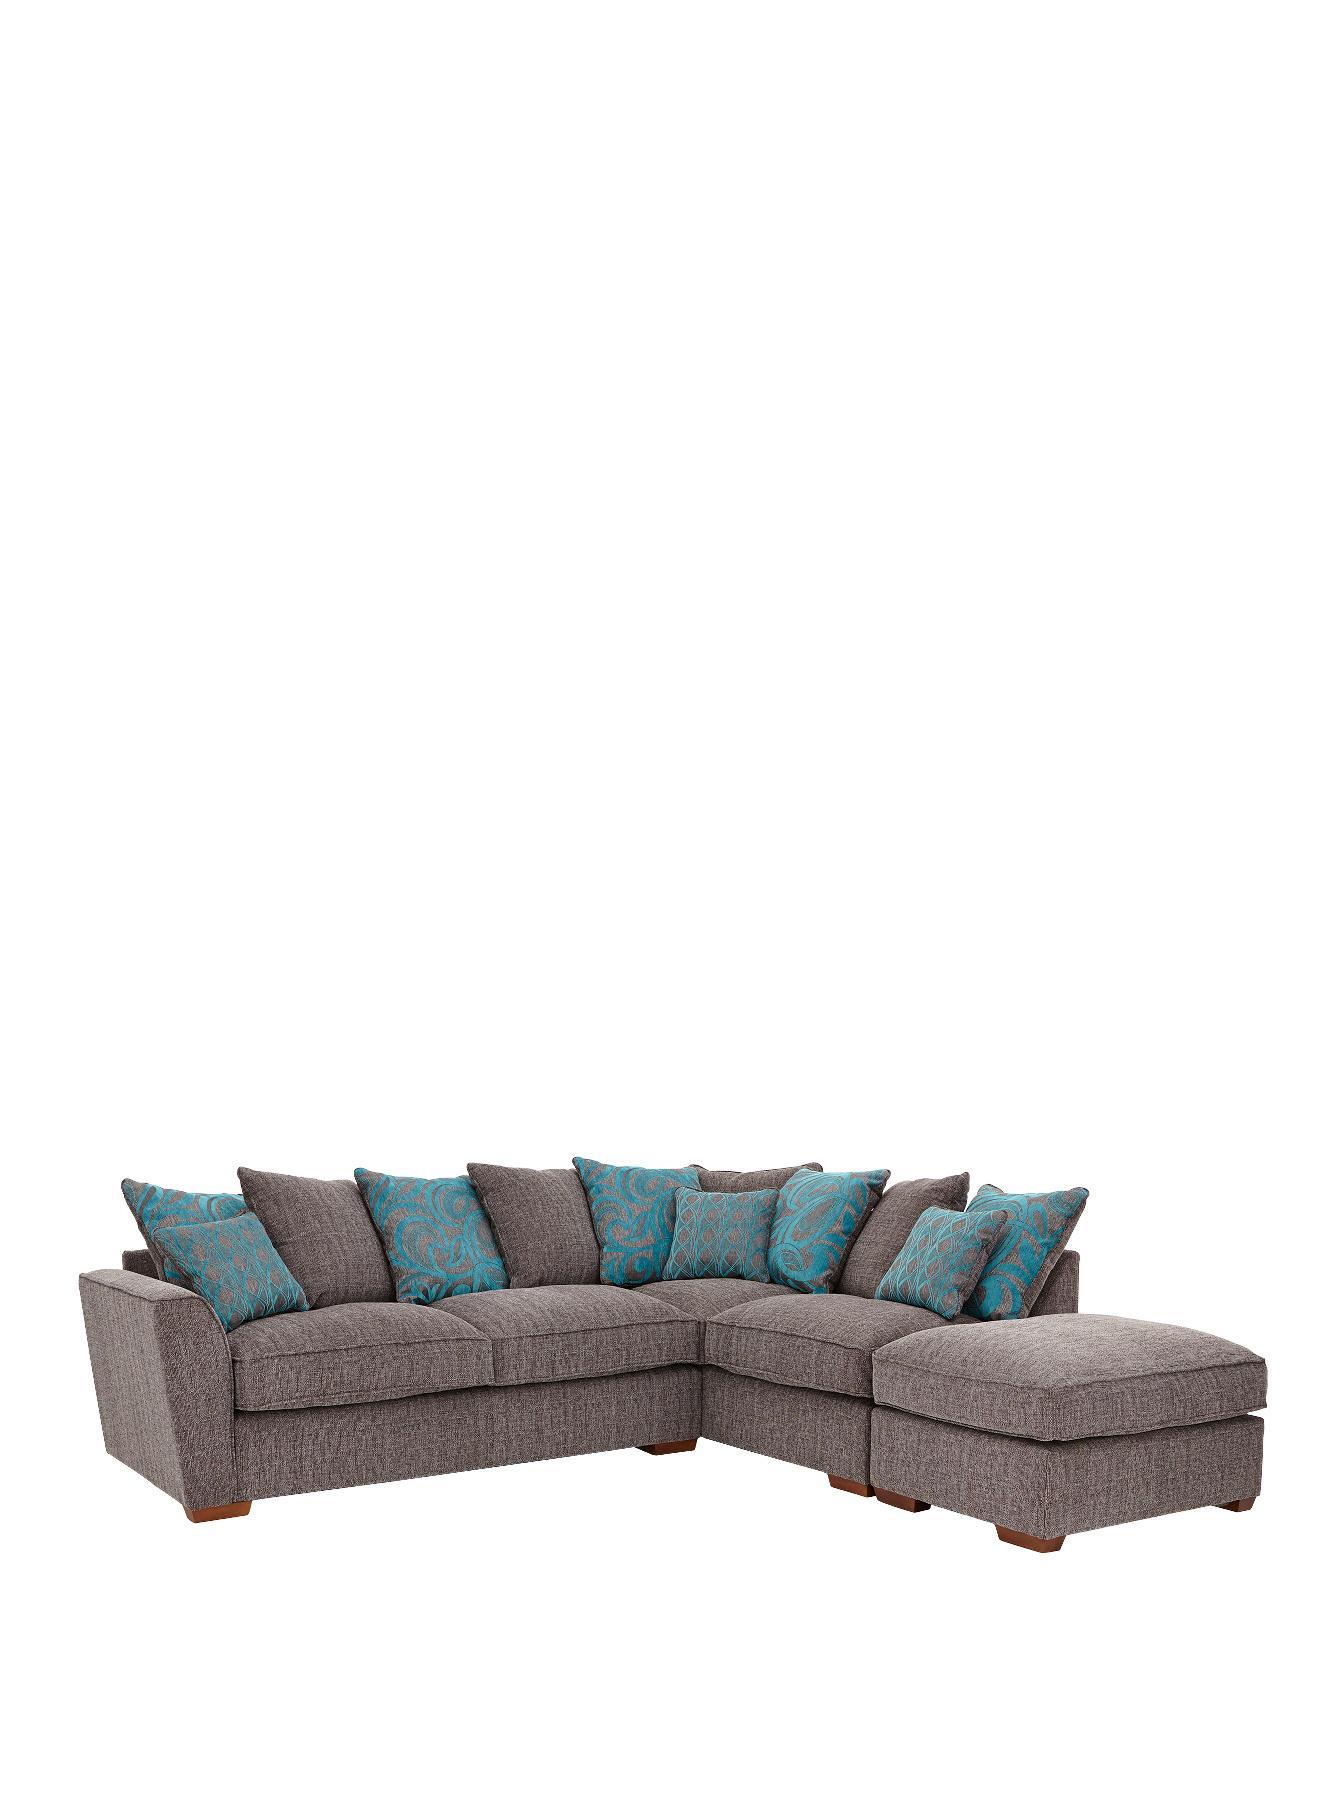 Newport Right Hand Corner Group Sofa with Footstool CharcoalGreyBeige